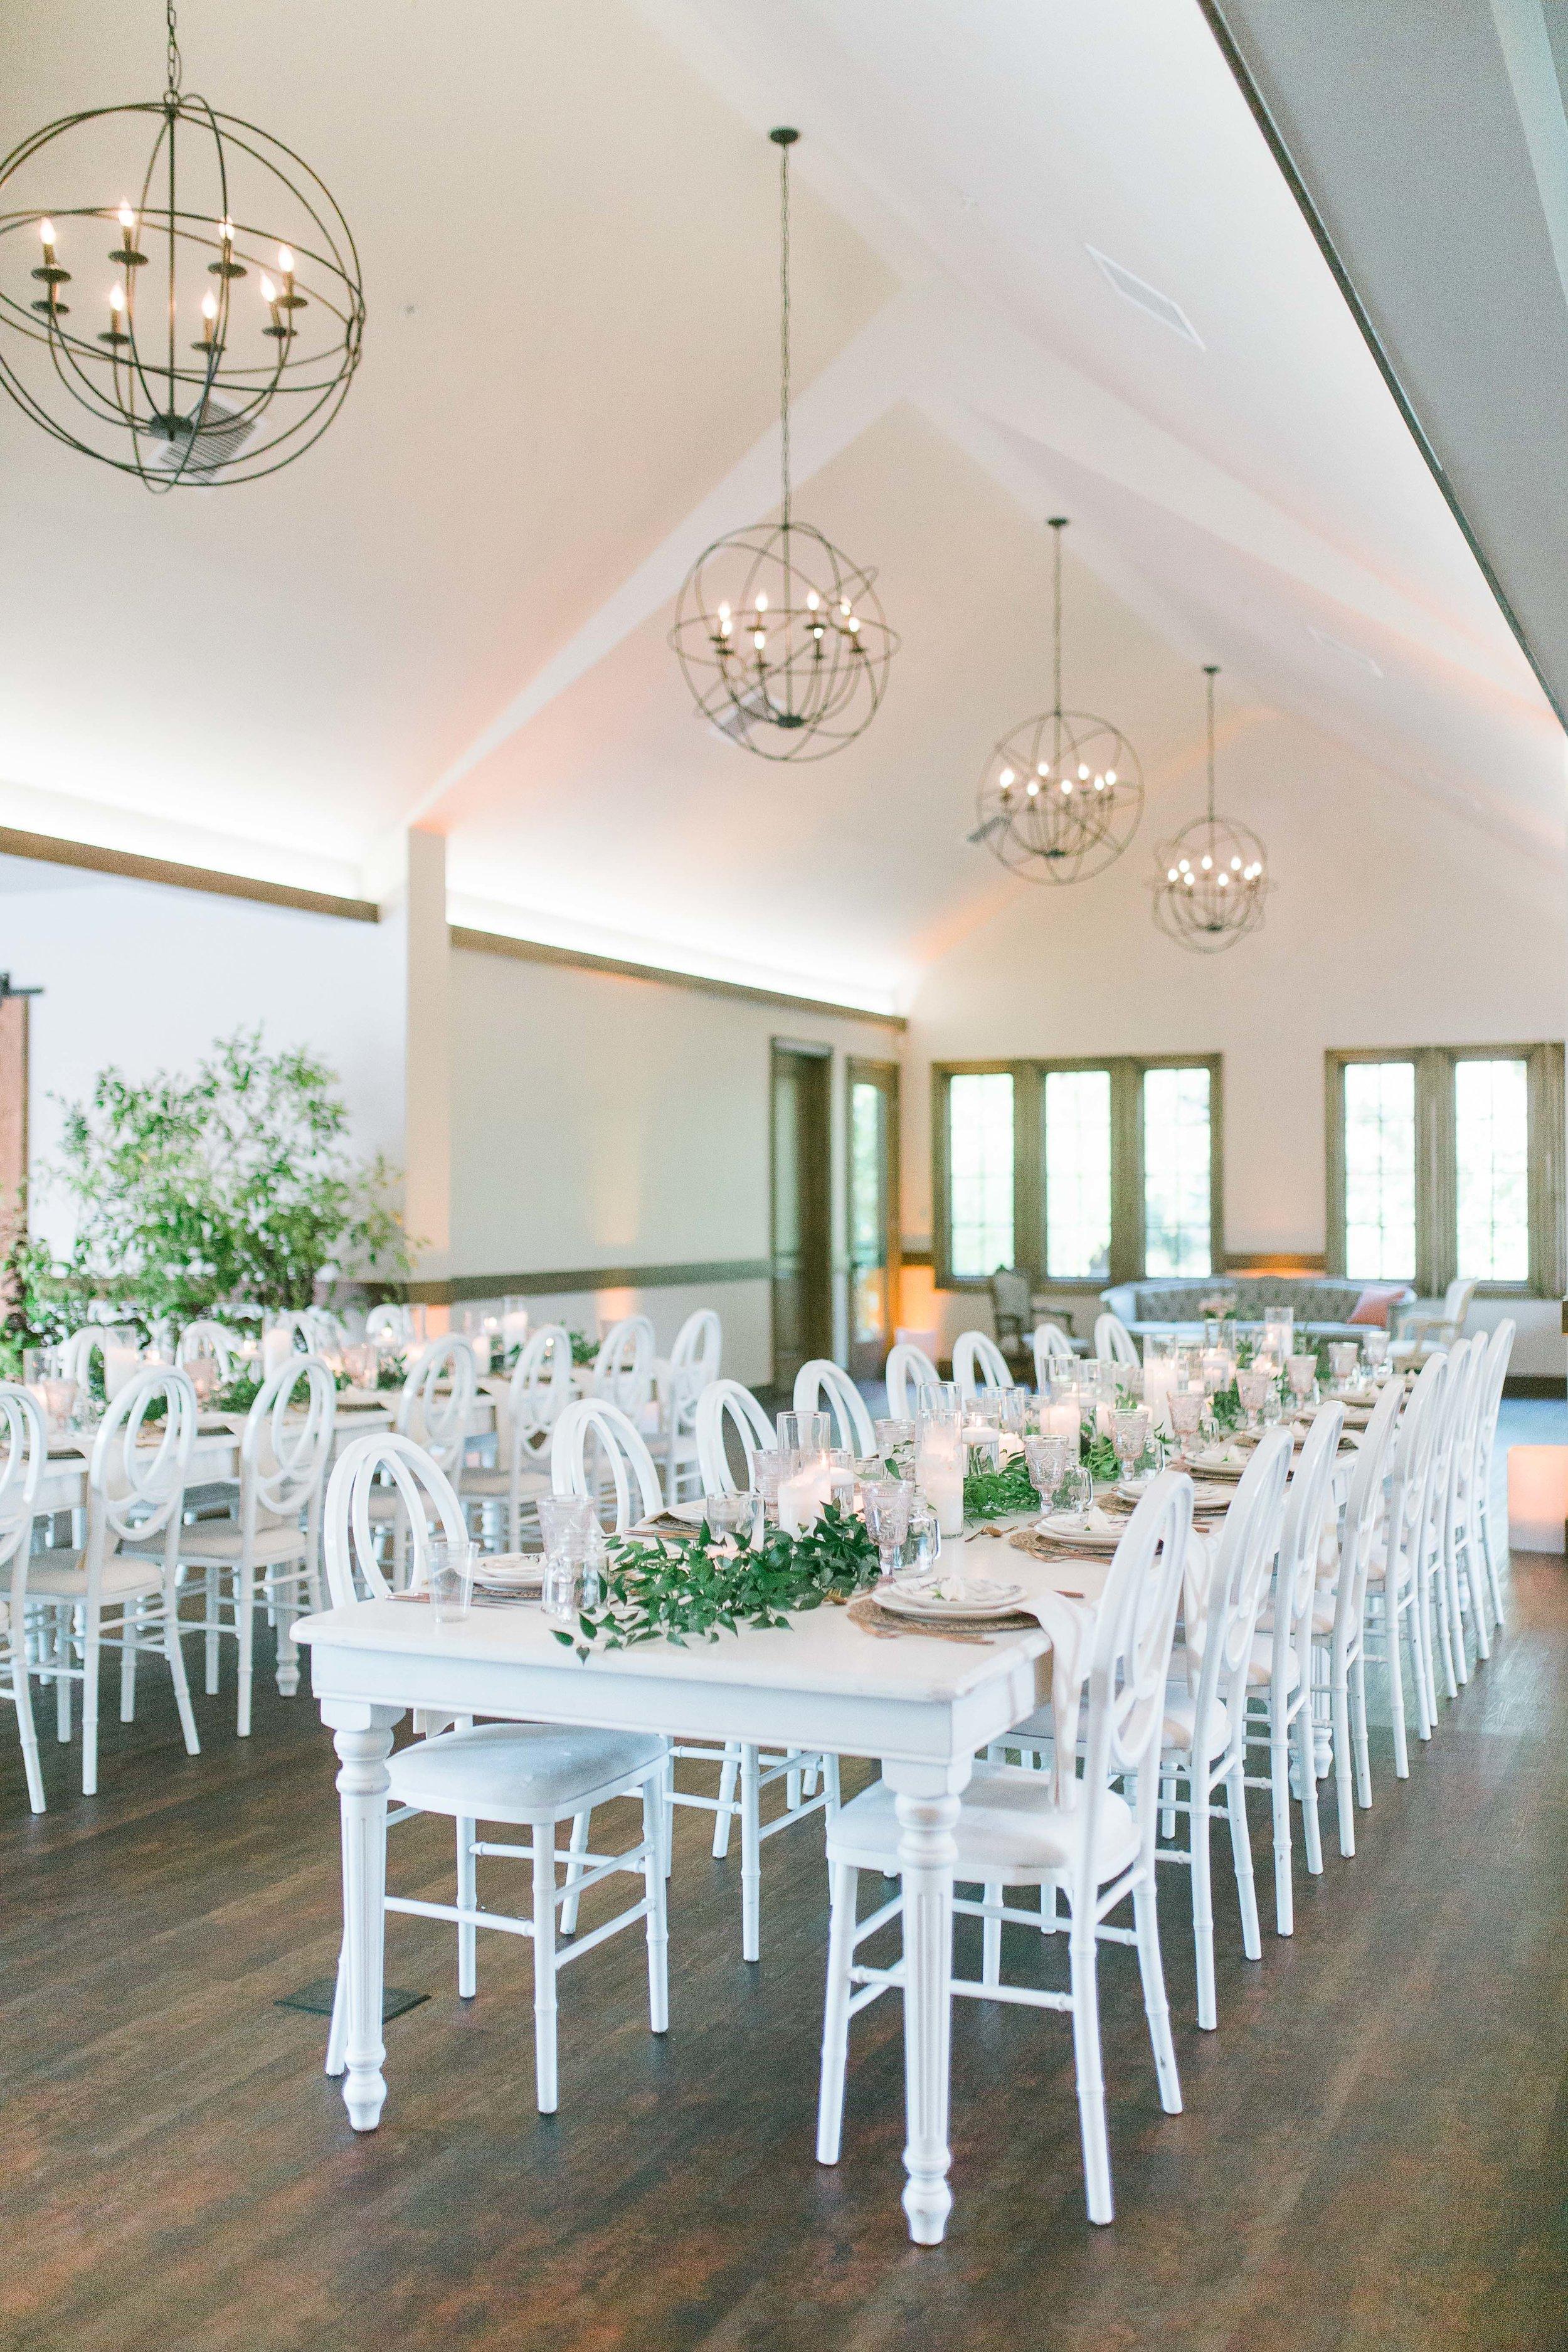 Hiddenbrooke-Wedding-Venue-by-JBJ-Pictures-210.jpg